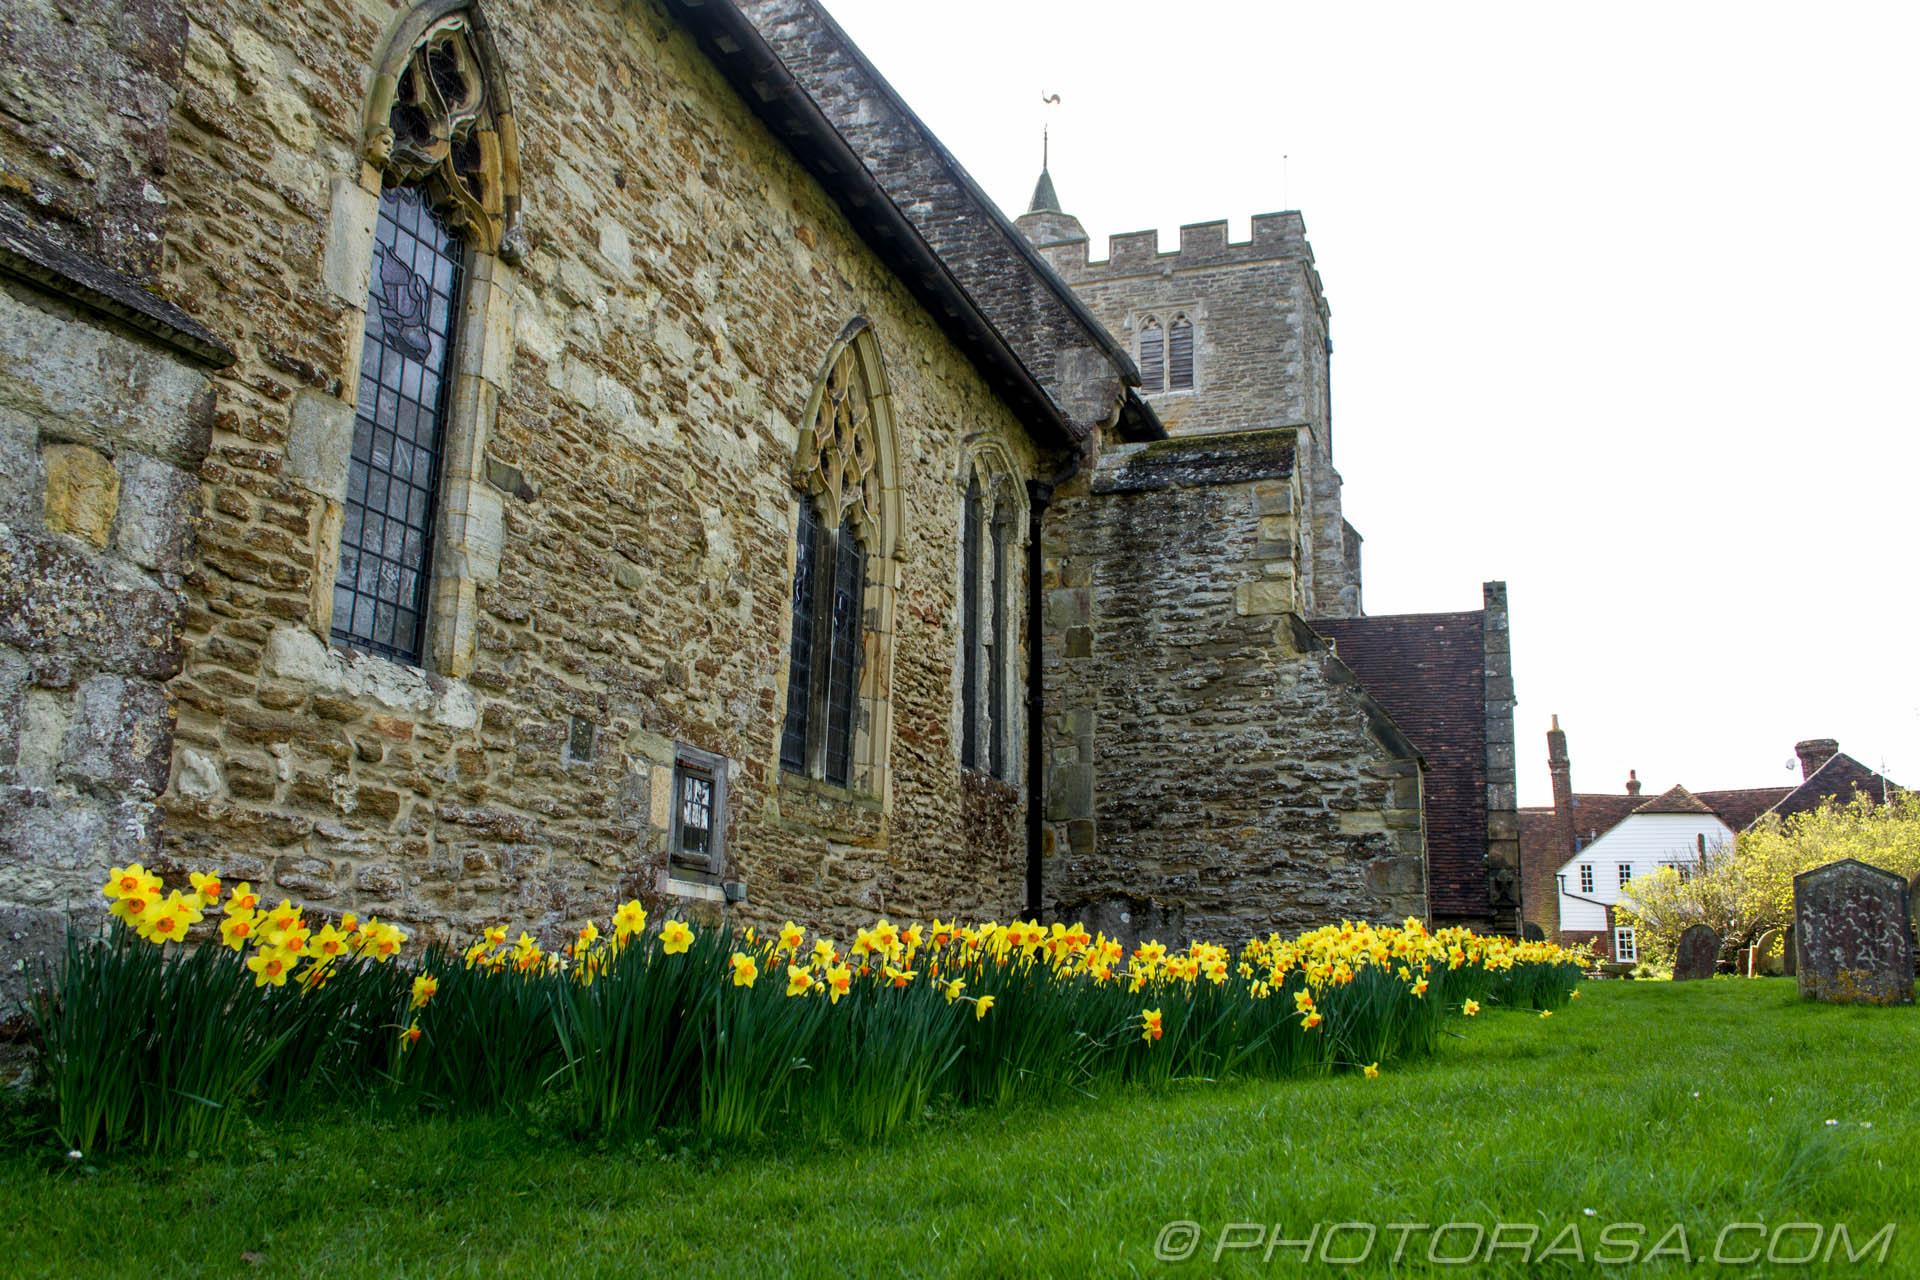 https://photorasa.com/saints-church-staplehurst-kent/daffodils-by-the-church/